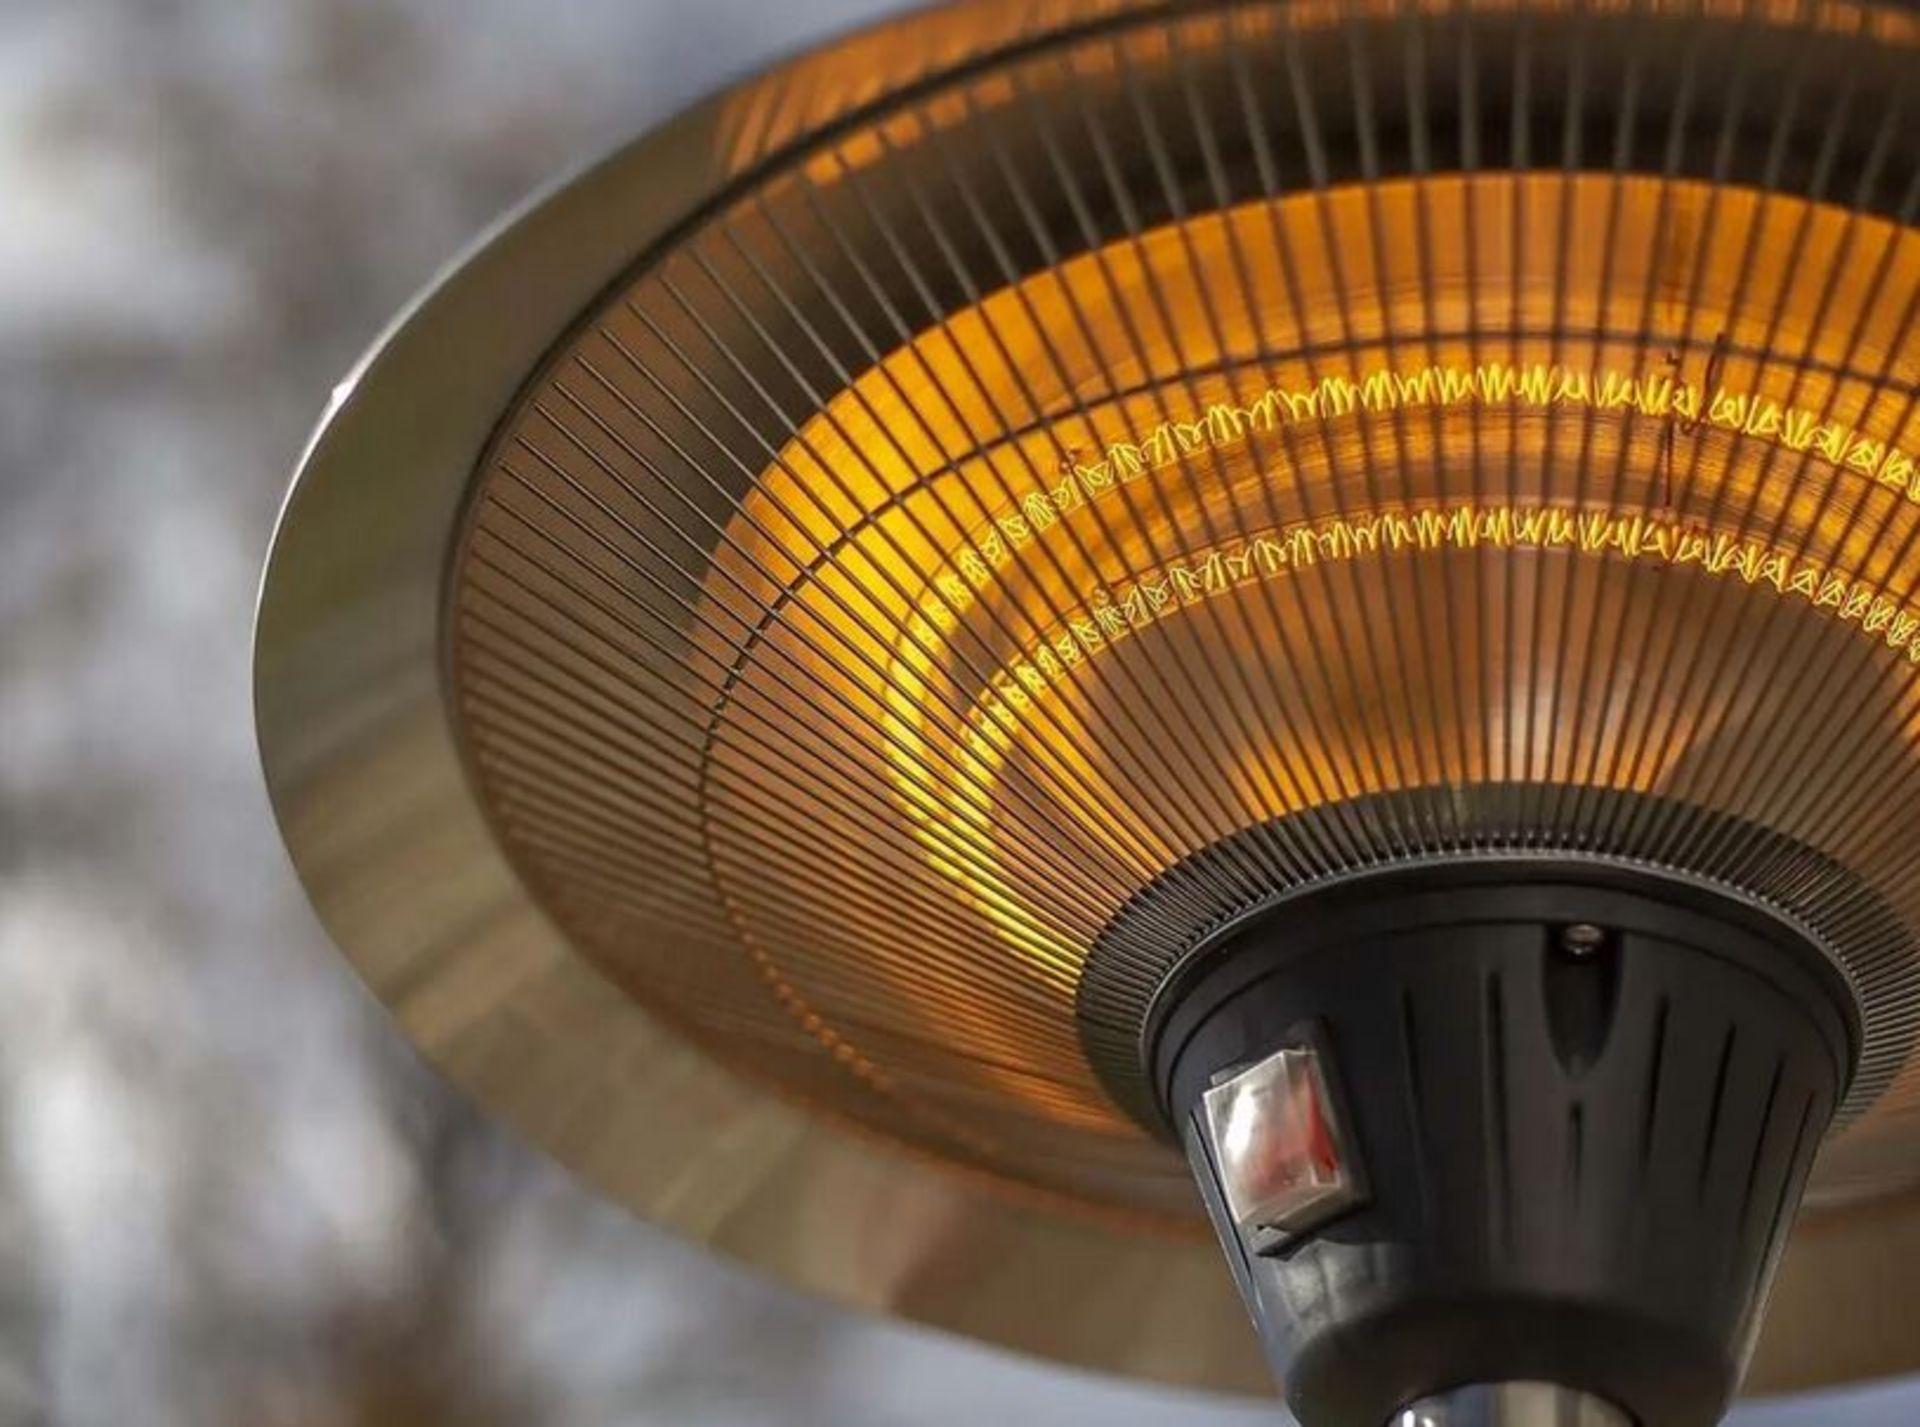 (P8) 1x La Hacienda Lume Standing Heater RRP £99.99. 3 Heater Settings: 900W, 1200W & 2100W (H205 - Image 2 of 3